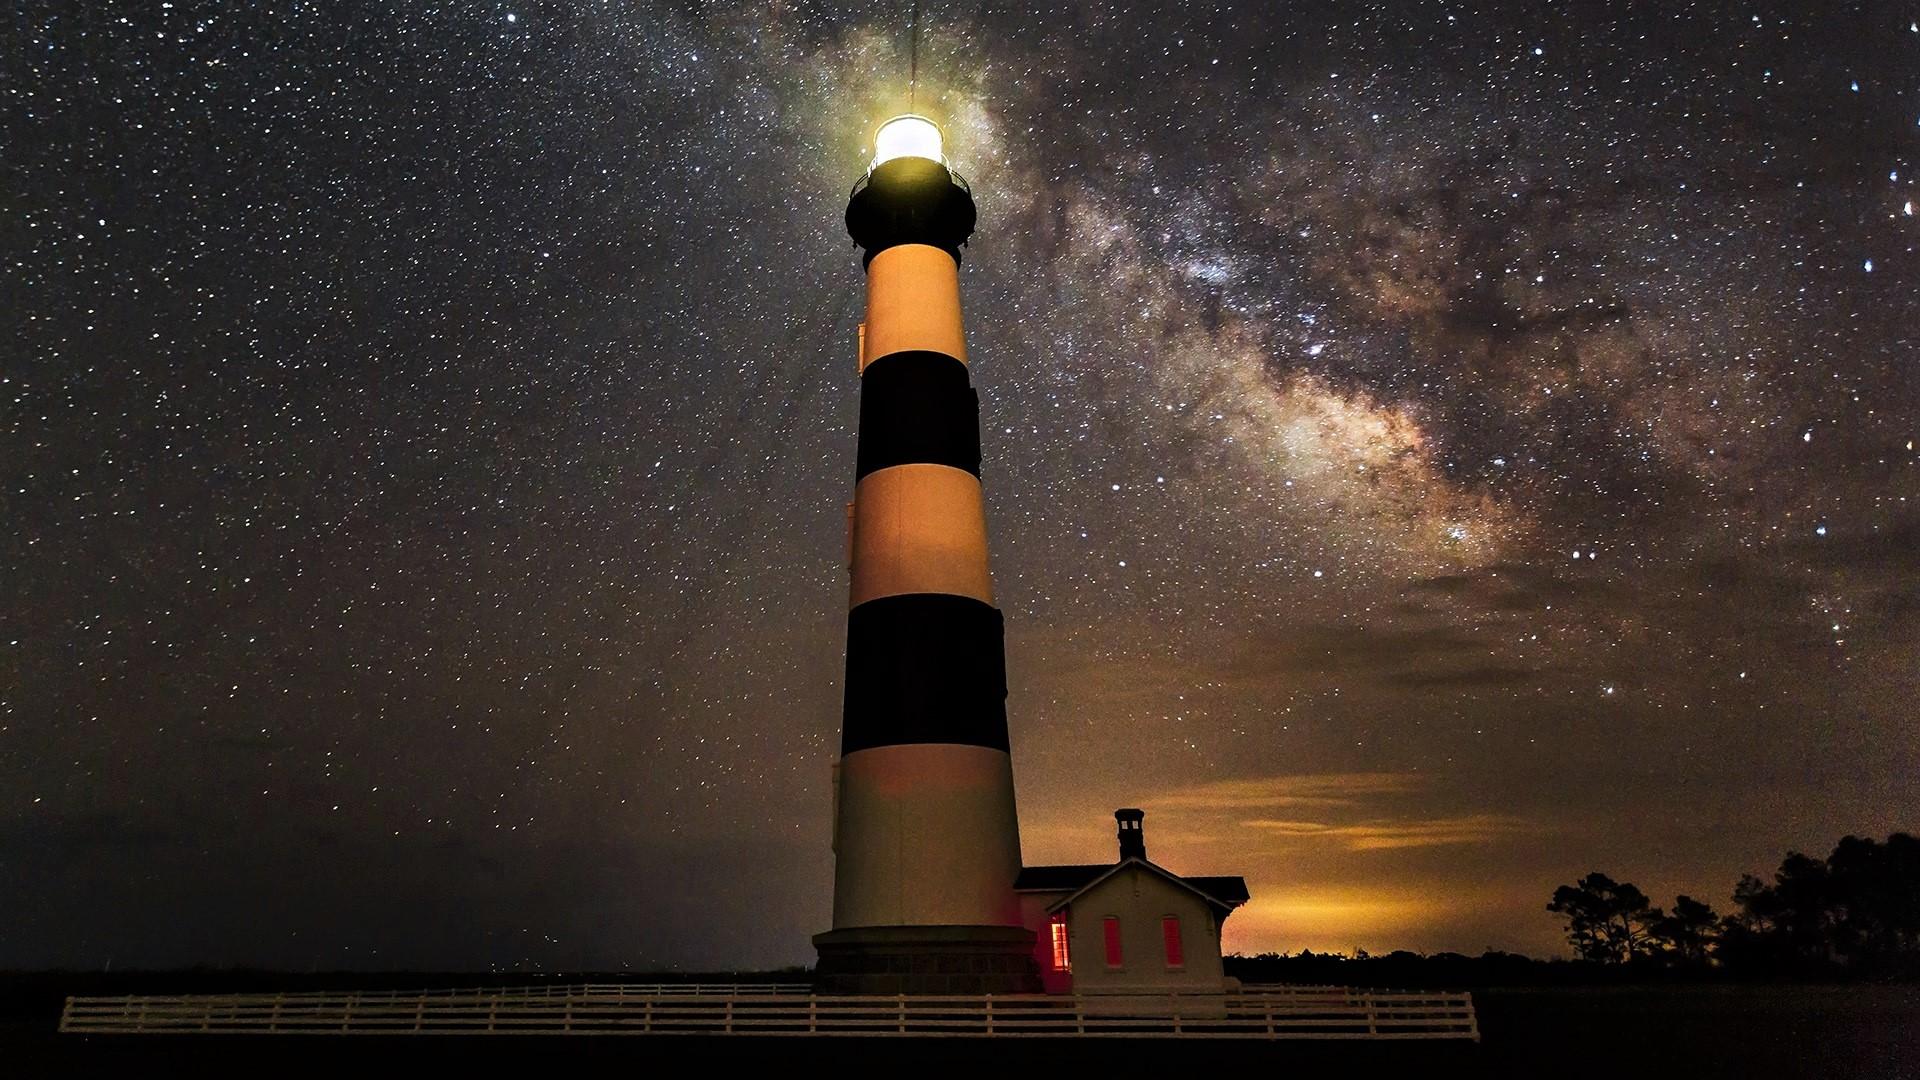 Fondos De Pantalla De Caroline: Bodie Lighthouse In North Carolina Fondo De Pantalla HD